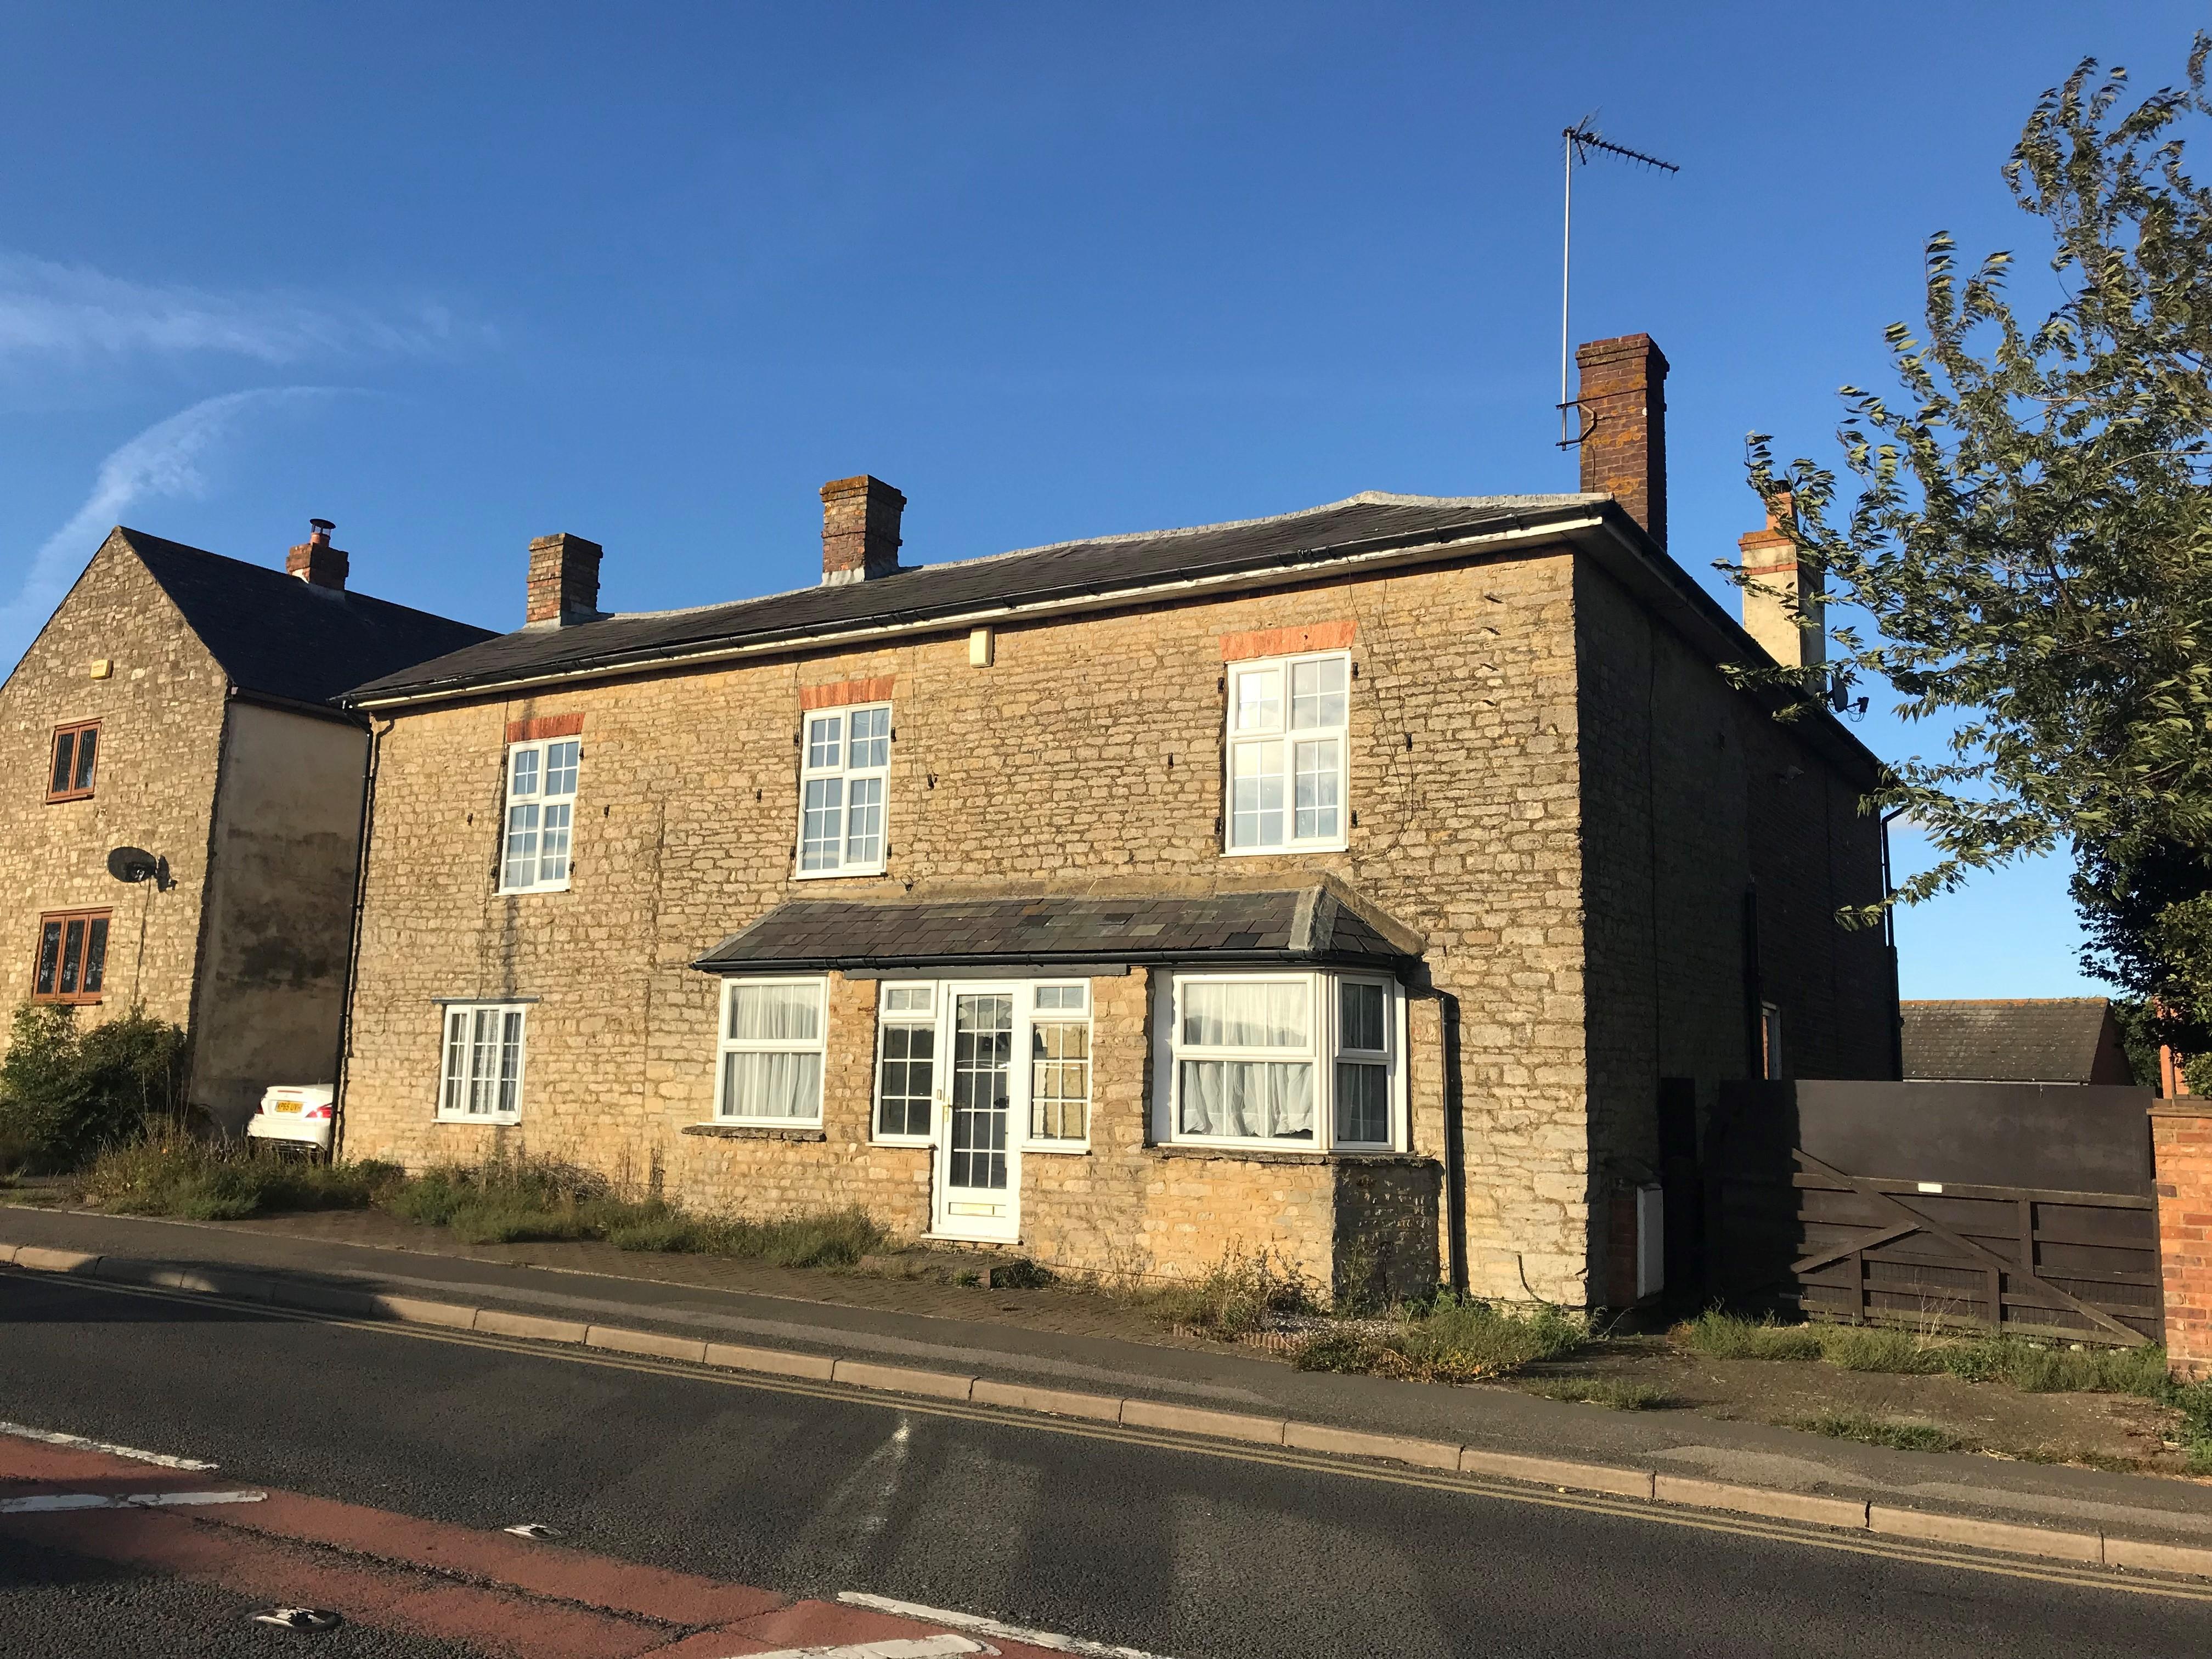 Watling Street, Towcester, Northamptonshire Image